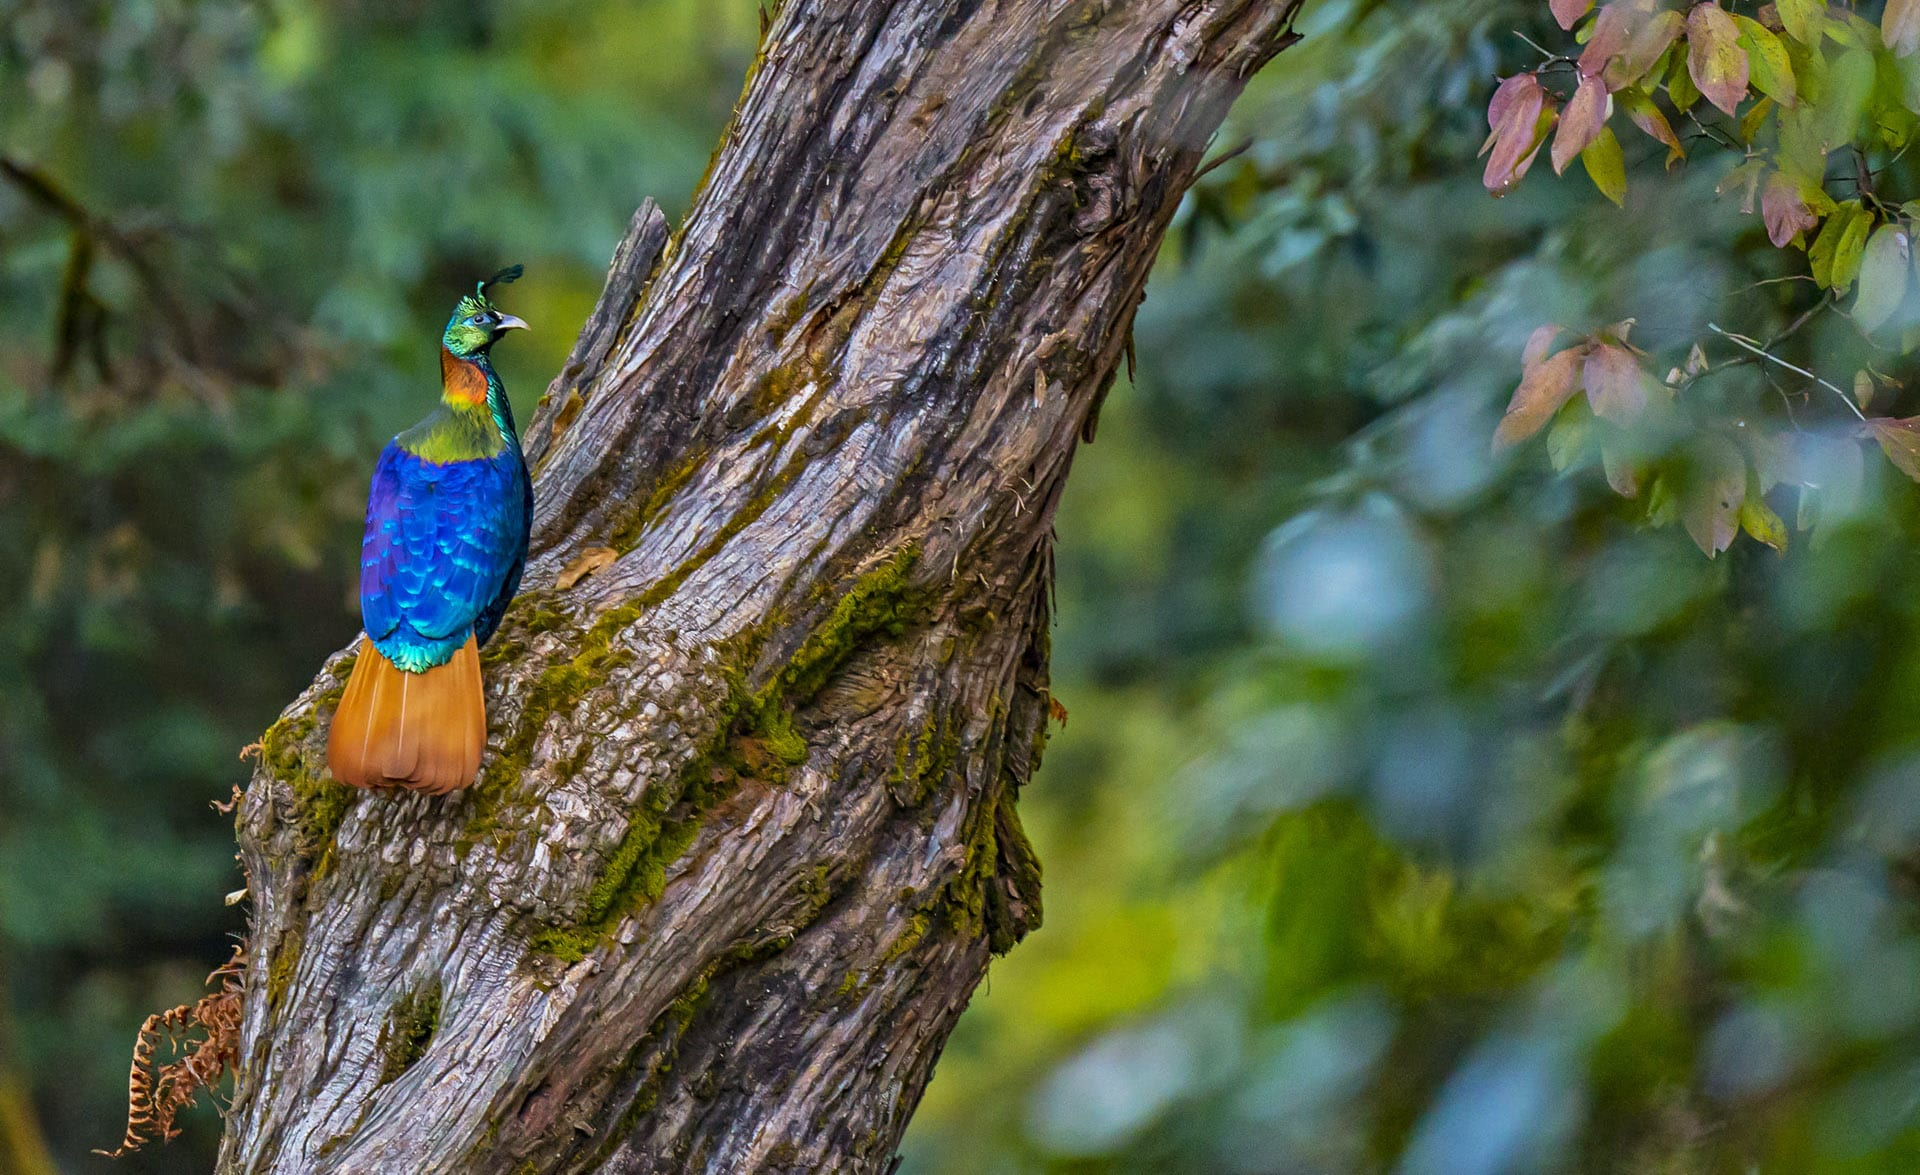 uttarakhand-kedarnath-wls-monal-male-sitting-on-tree-bark